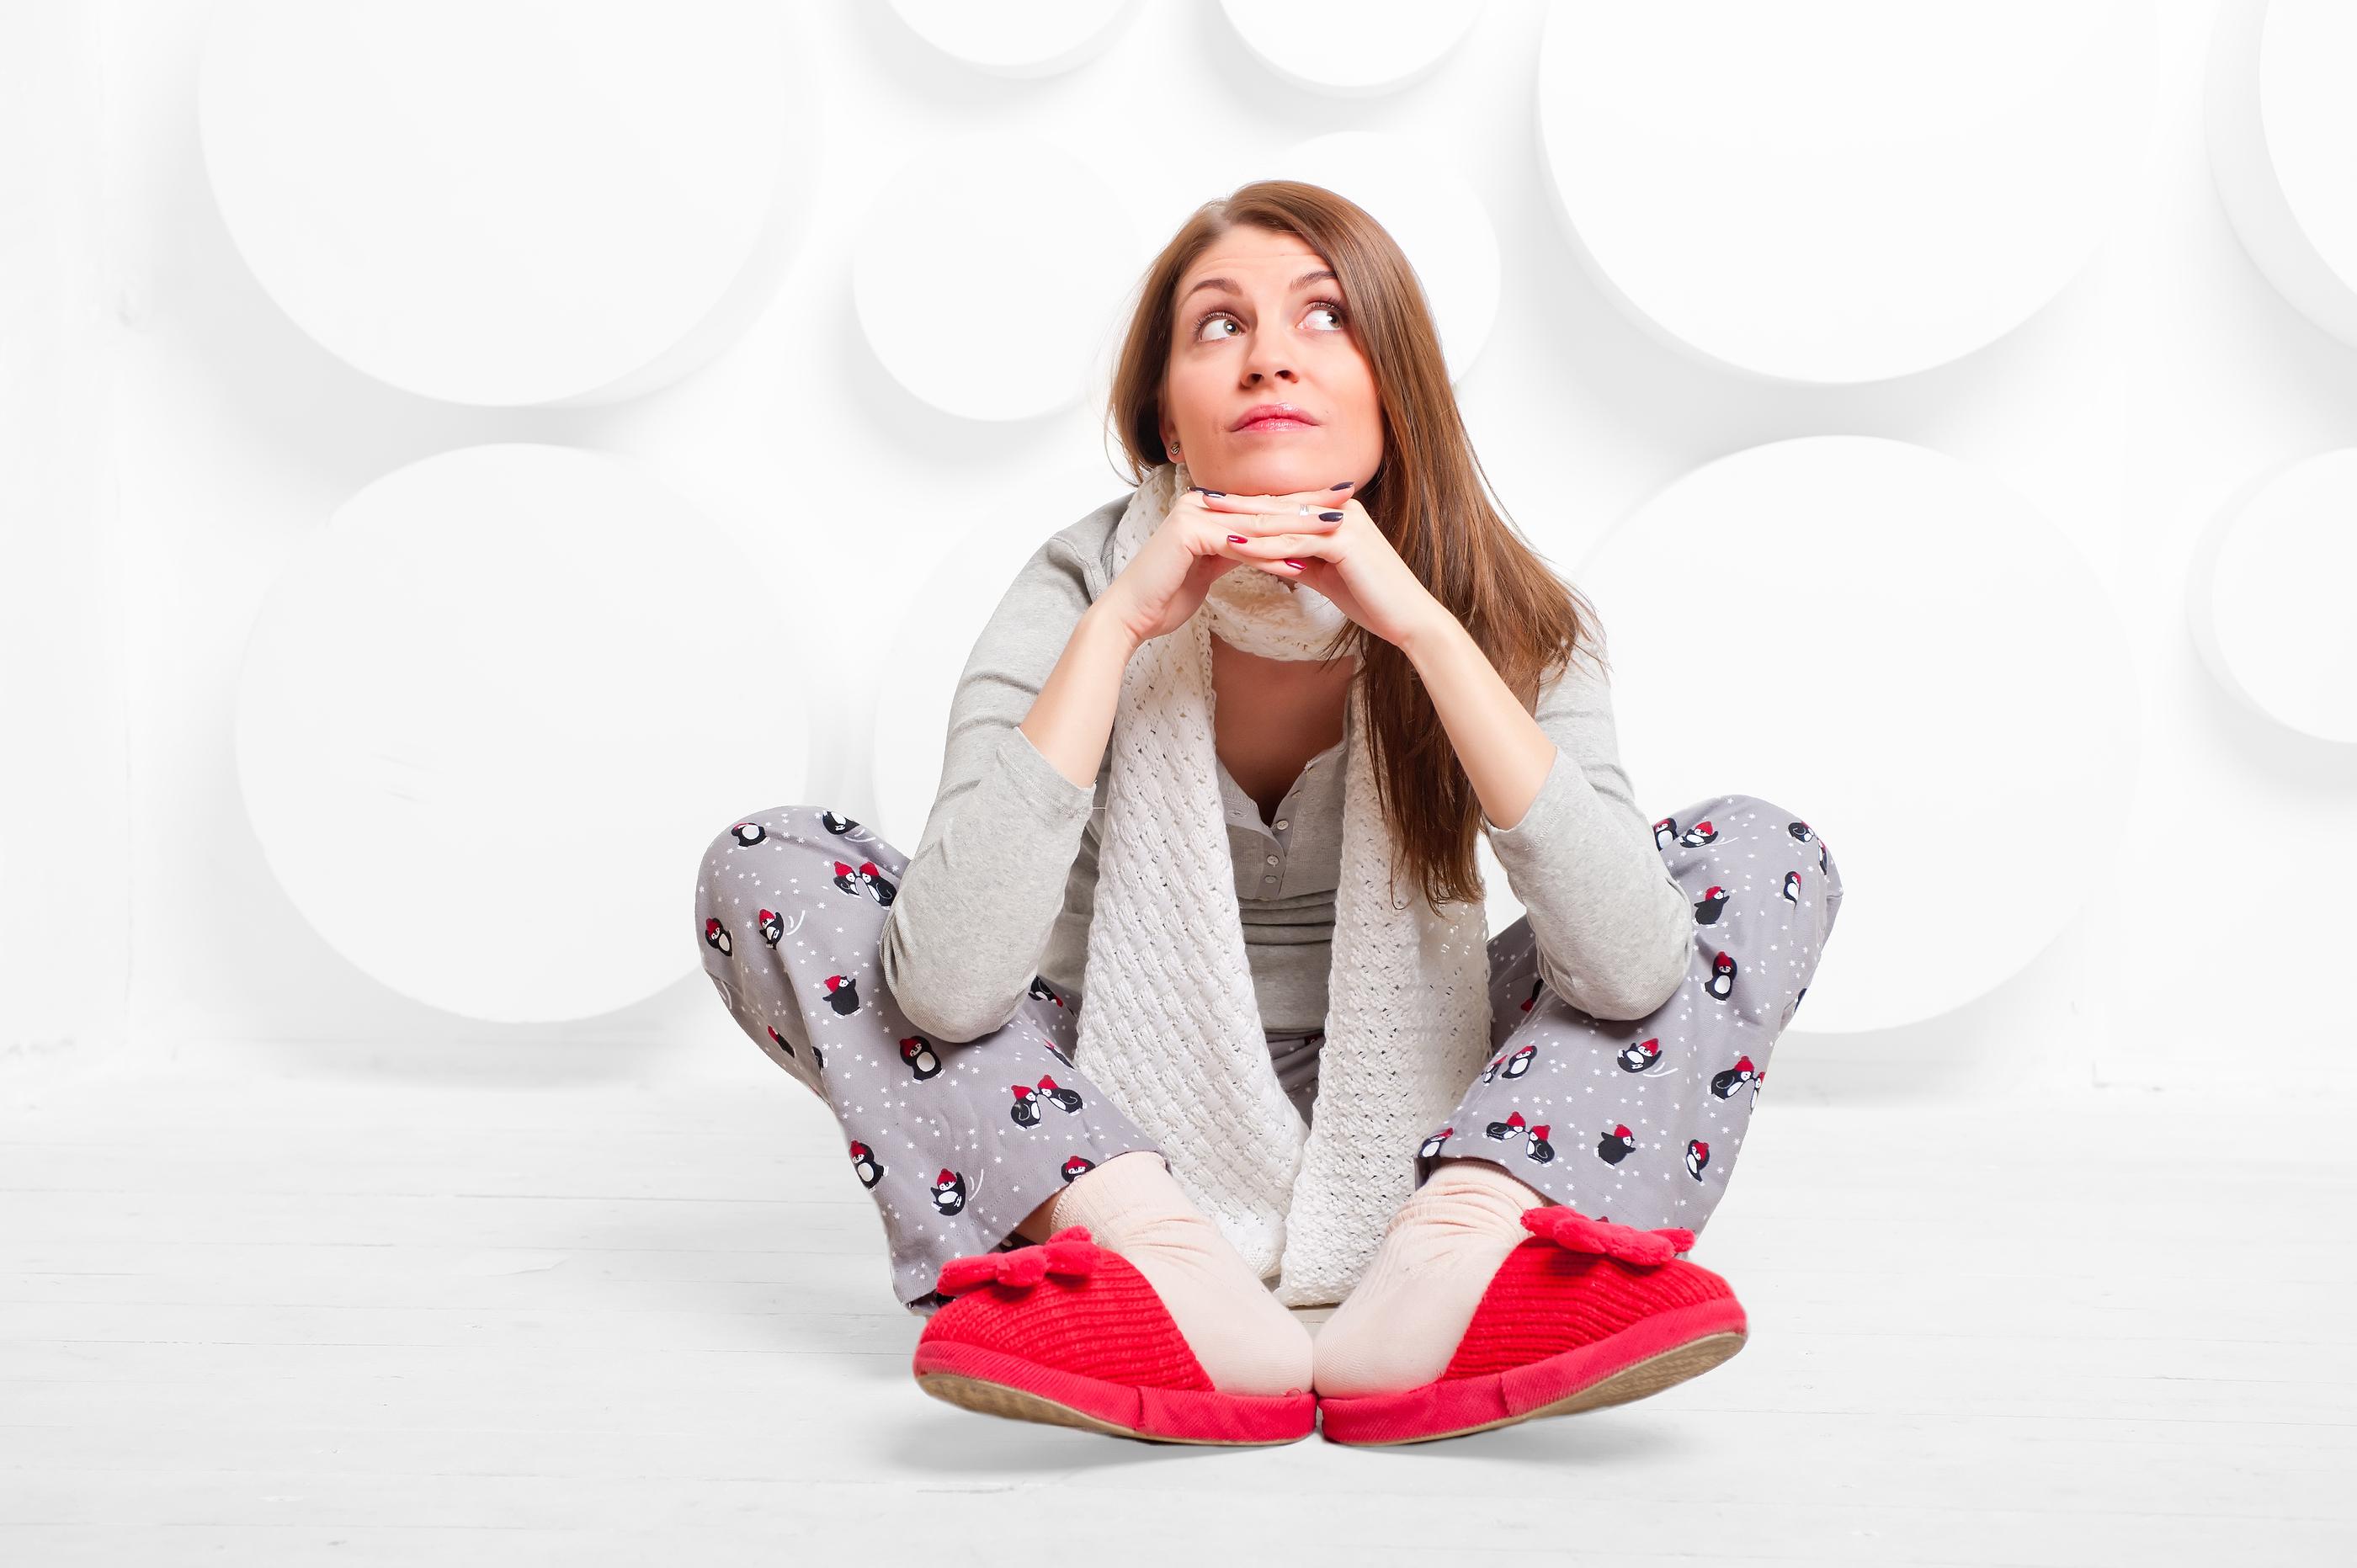 Girl In Studio In Slippers And Pajamas